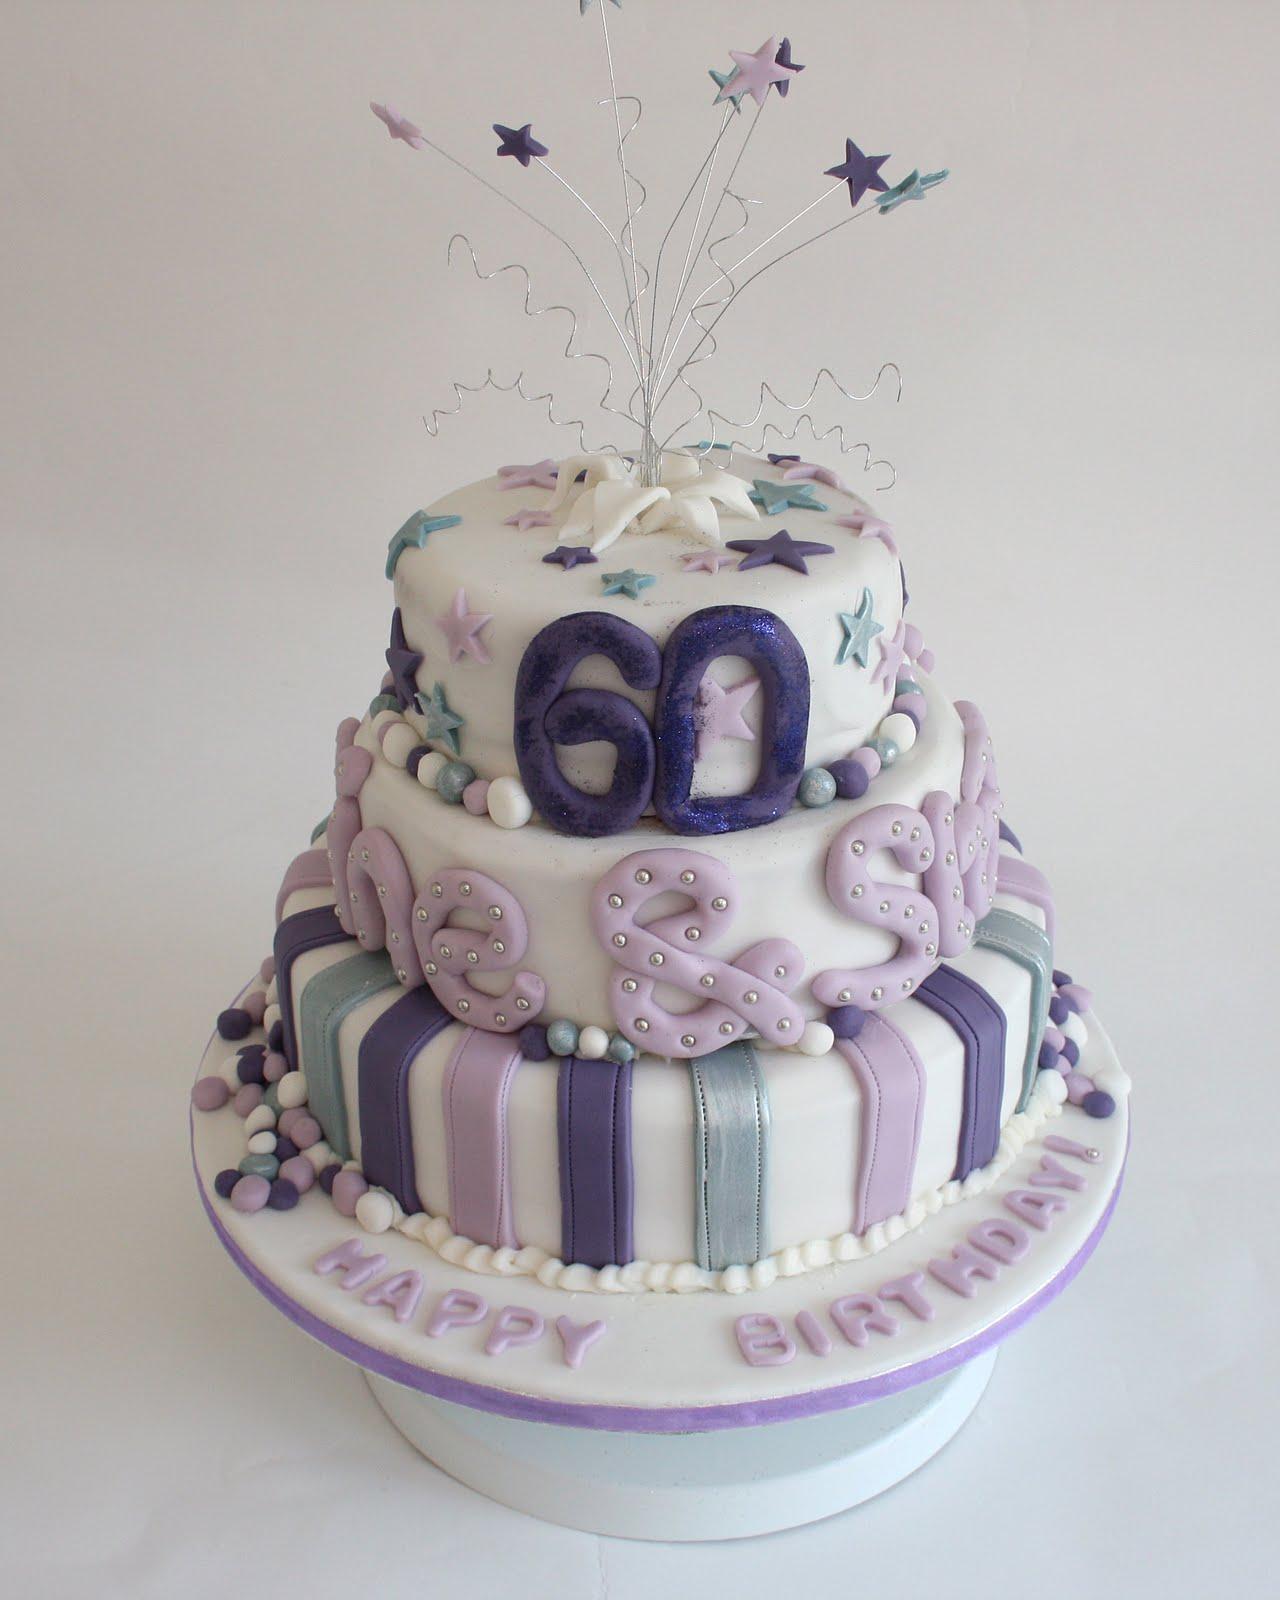 Sixtieth Birthday Cakes